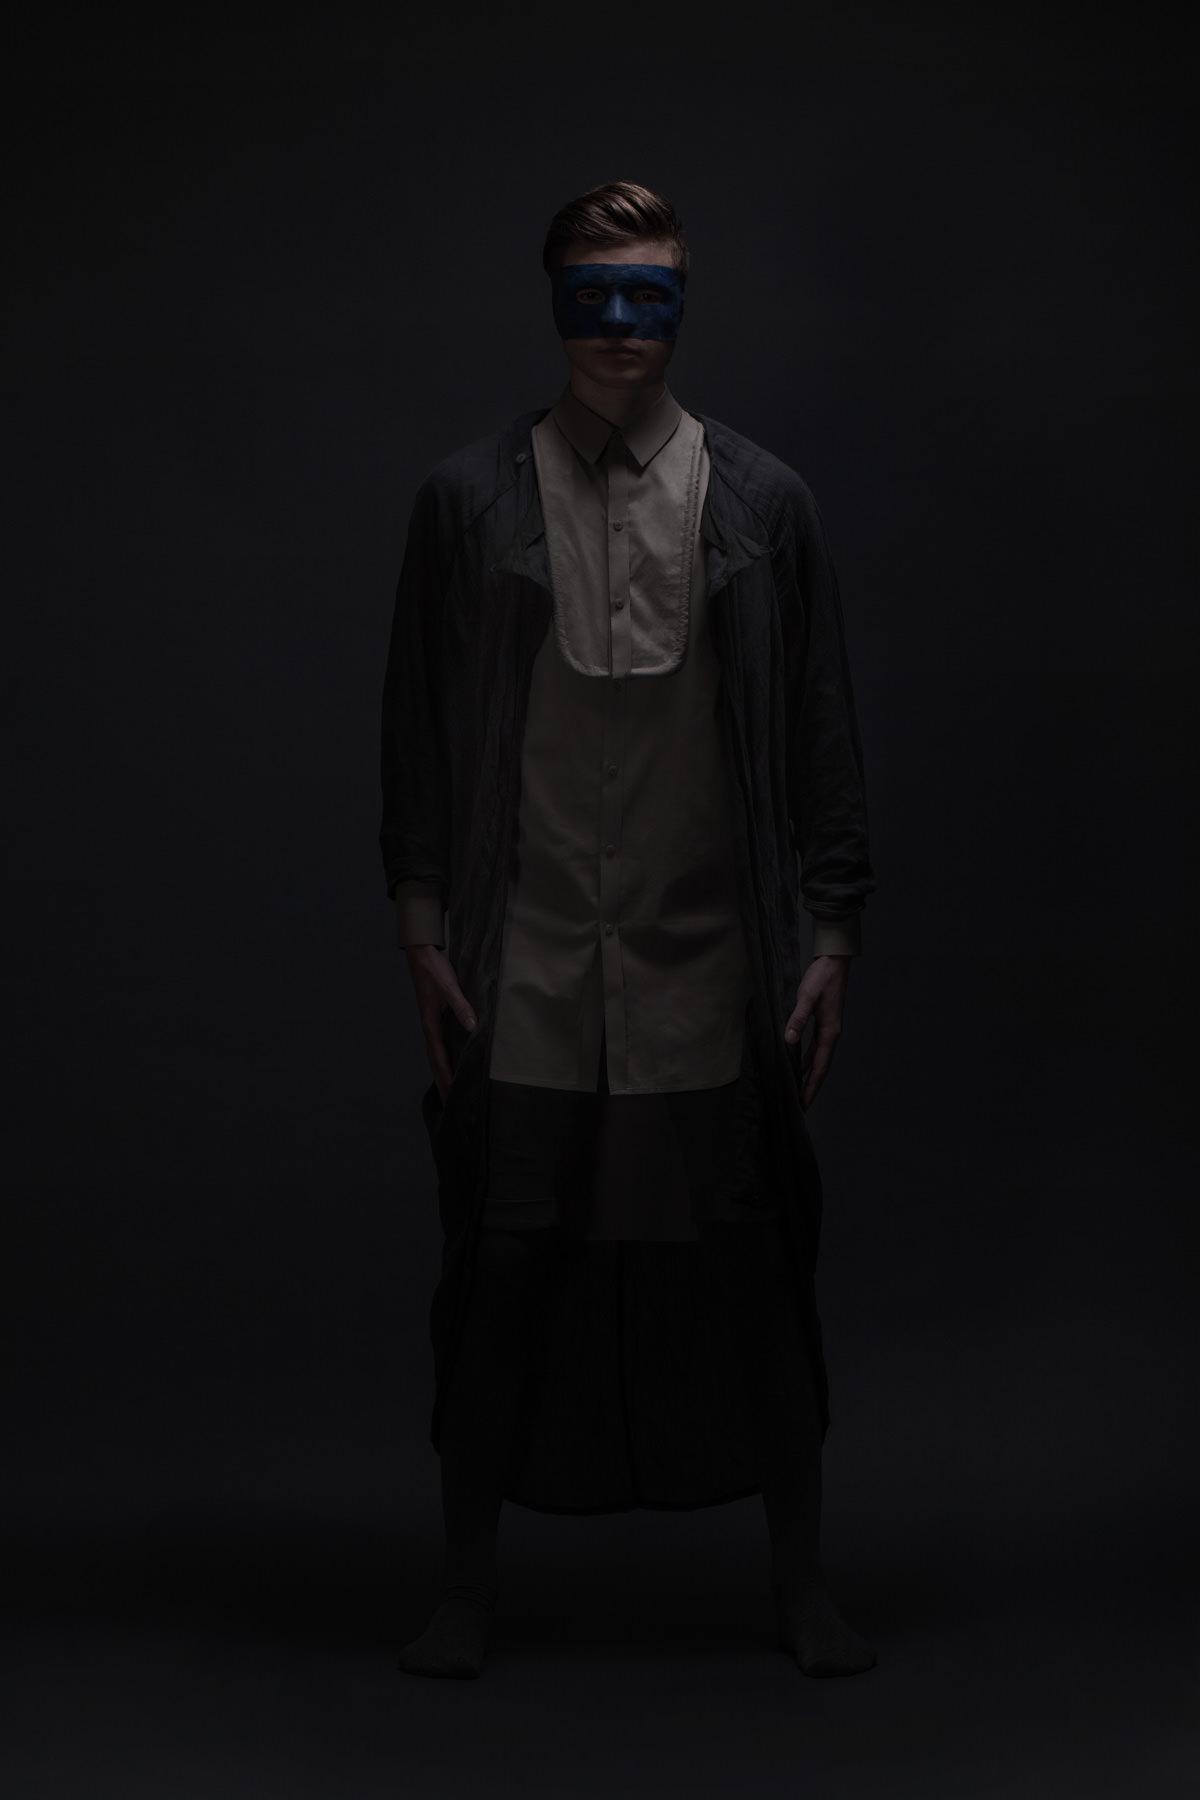 mode lukas fischer bad man blau grau maske superior superhelden maske studio dunkel duster exoskelett jörn strojny